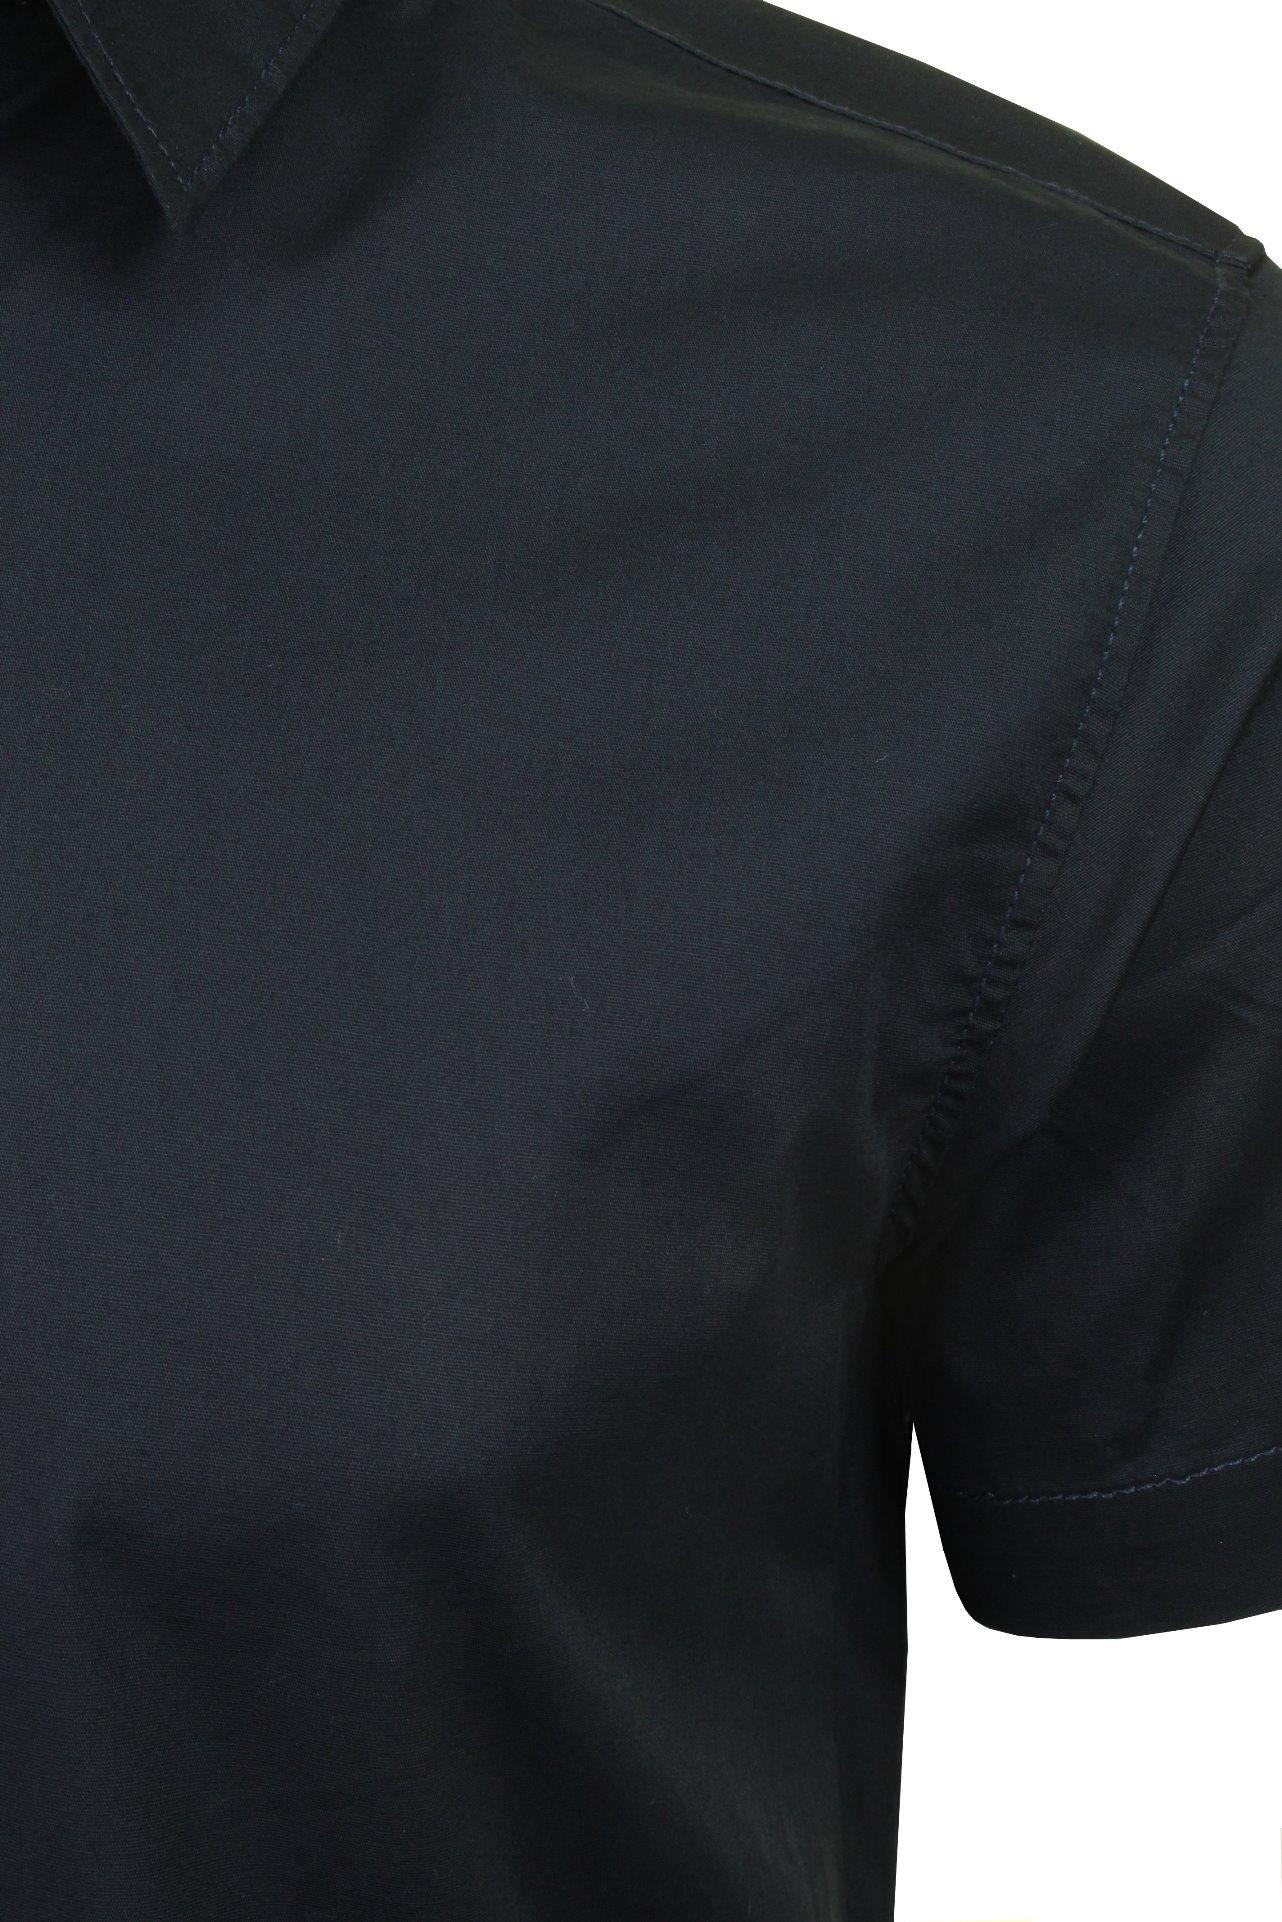 Jack-amp-Jones-Mens-039-Clint-039-Poplin-Shirt-Short-Sleeved thumbnail 10